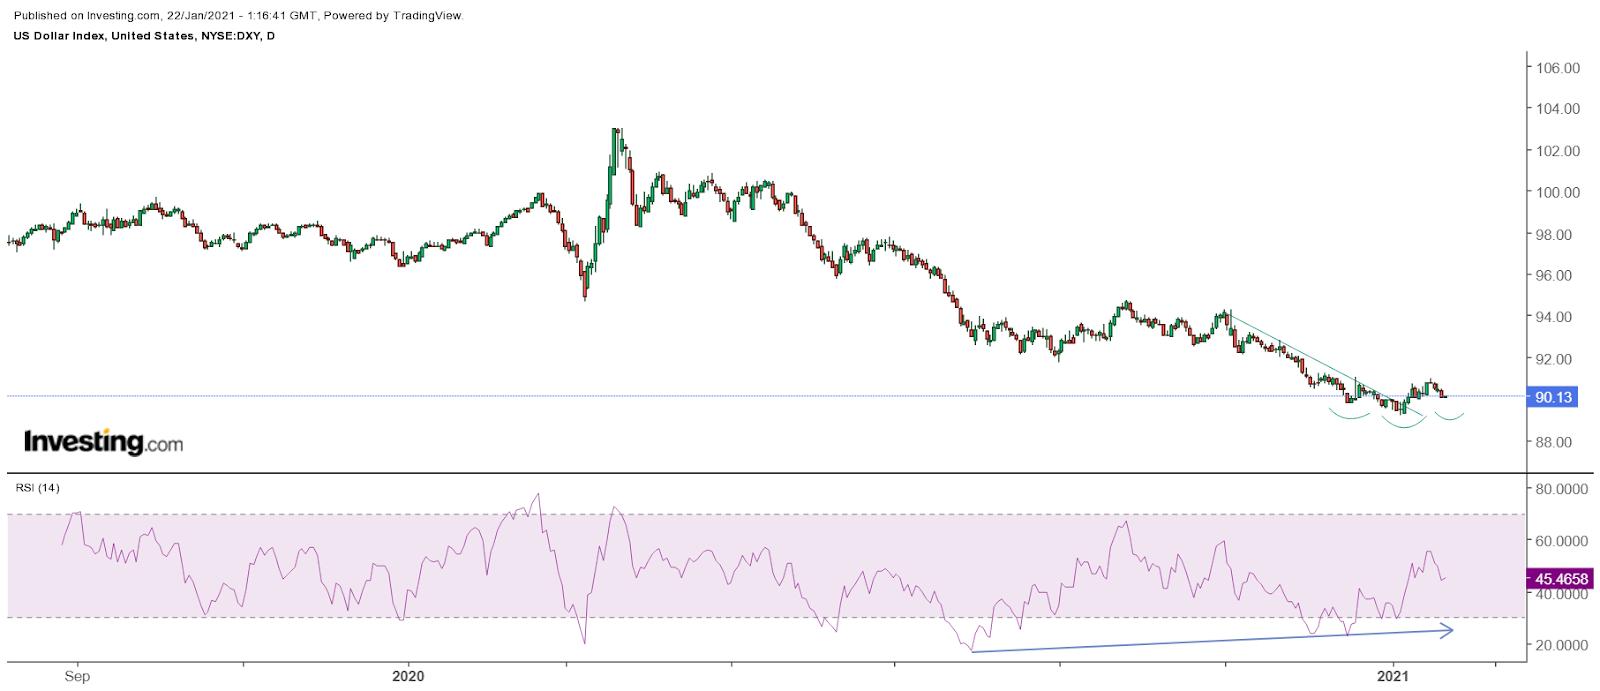 مؤشر الدولار - رسم بياني يومي